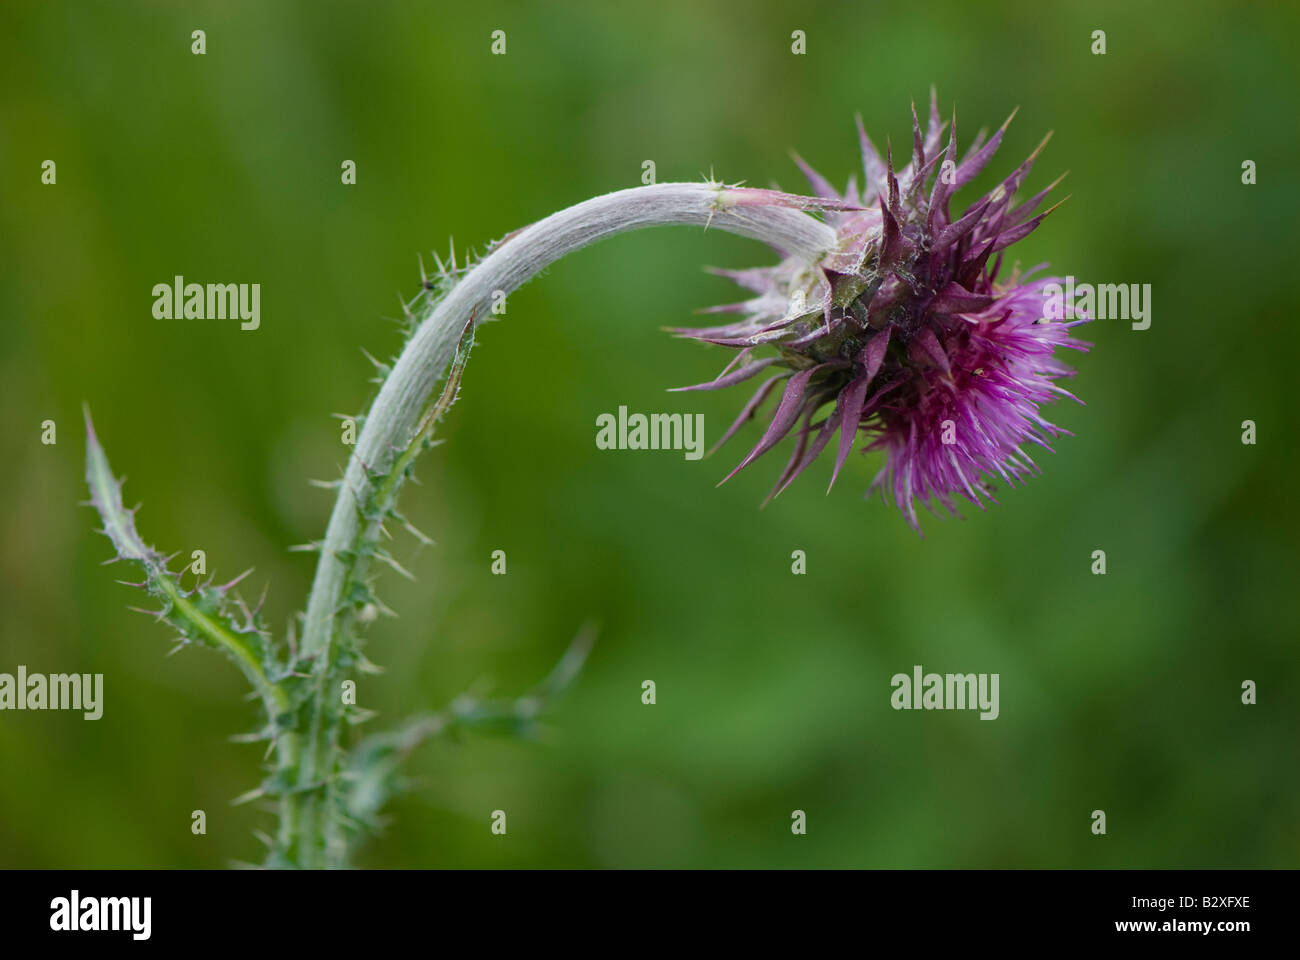 Fuchsia épineux chardon contre verdure. Photo Stock